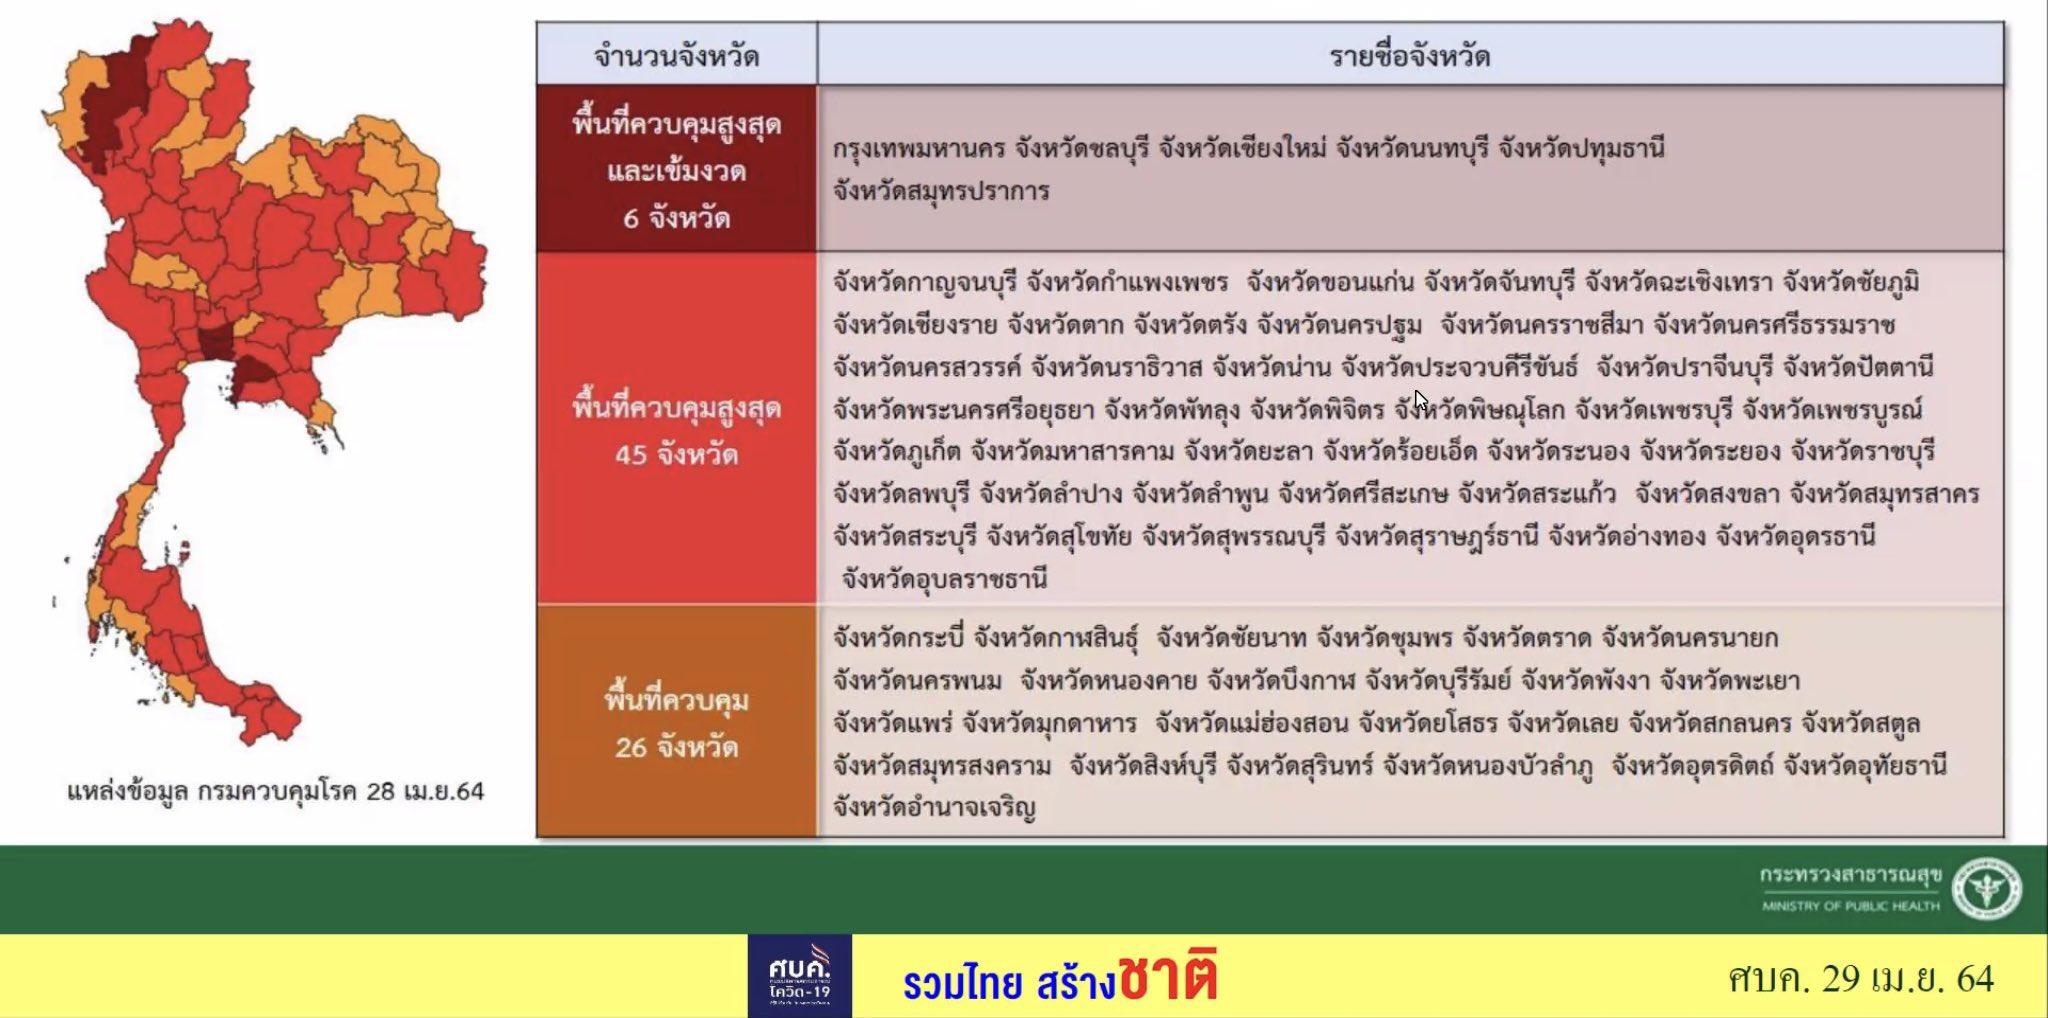 www.thaiguide.dk/images/forum/covid19/nye%20zoner%2029-04-21.jpeg